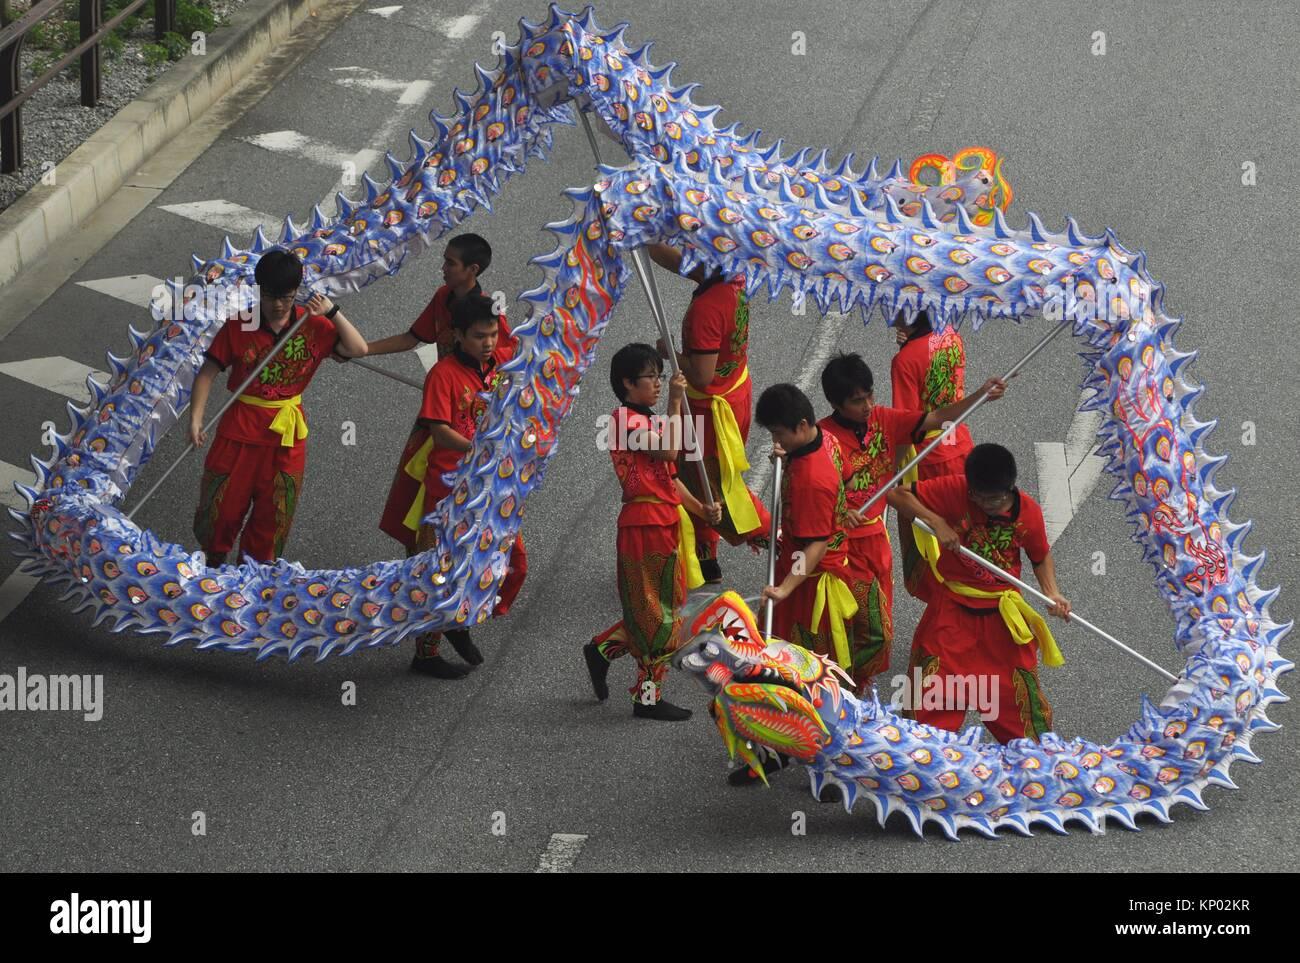 Naha, Okinawa, Japan: Dragon parade during the 6th Worldwide Uchinanchu Festival, celebrating the Okinawan emigrants - Stock Image